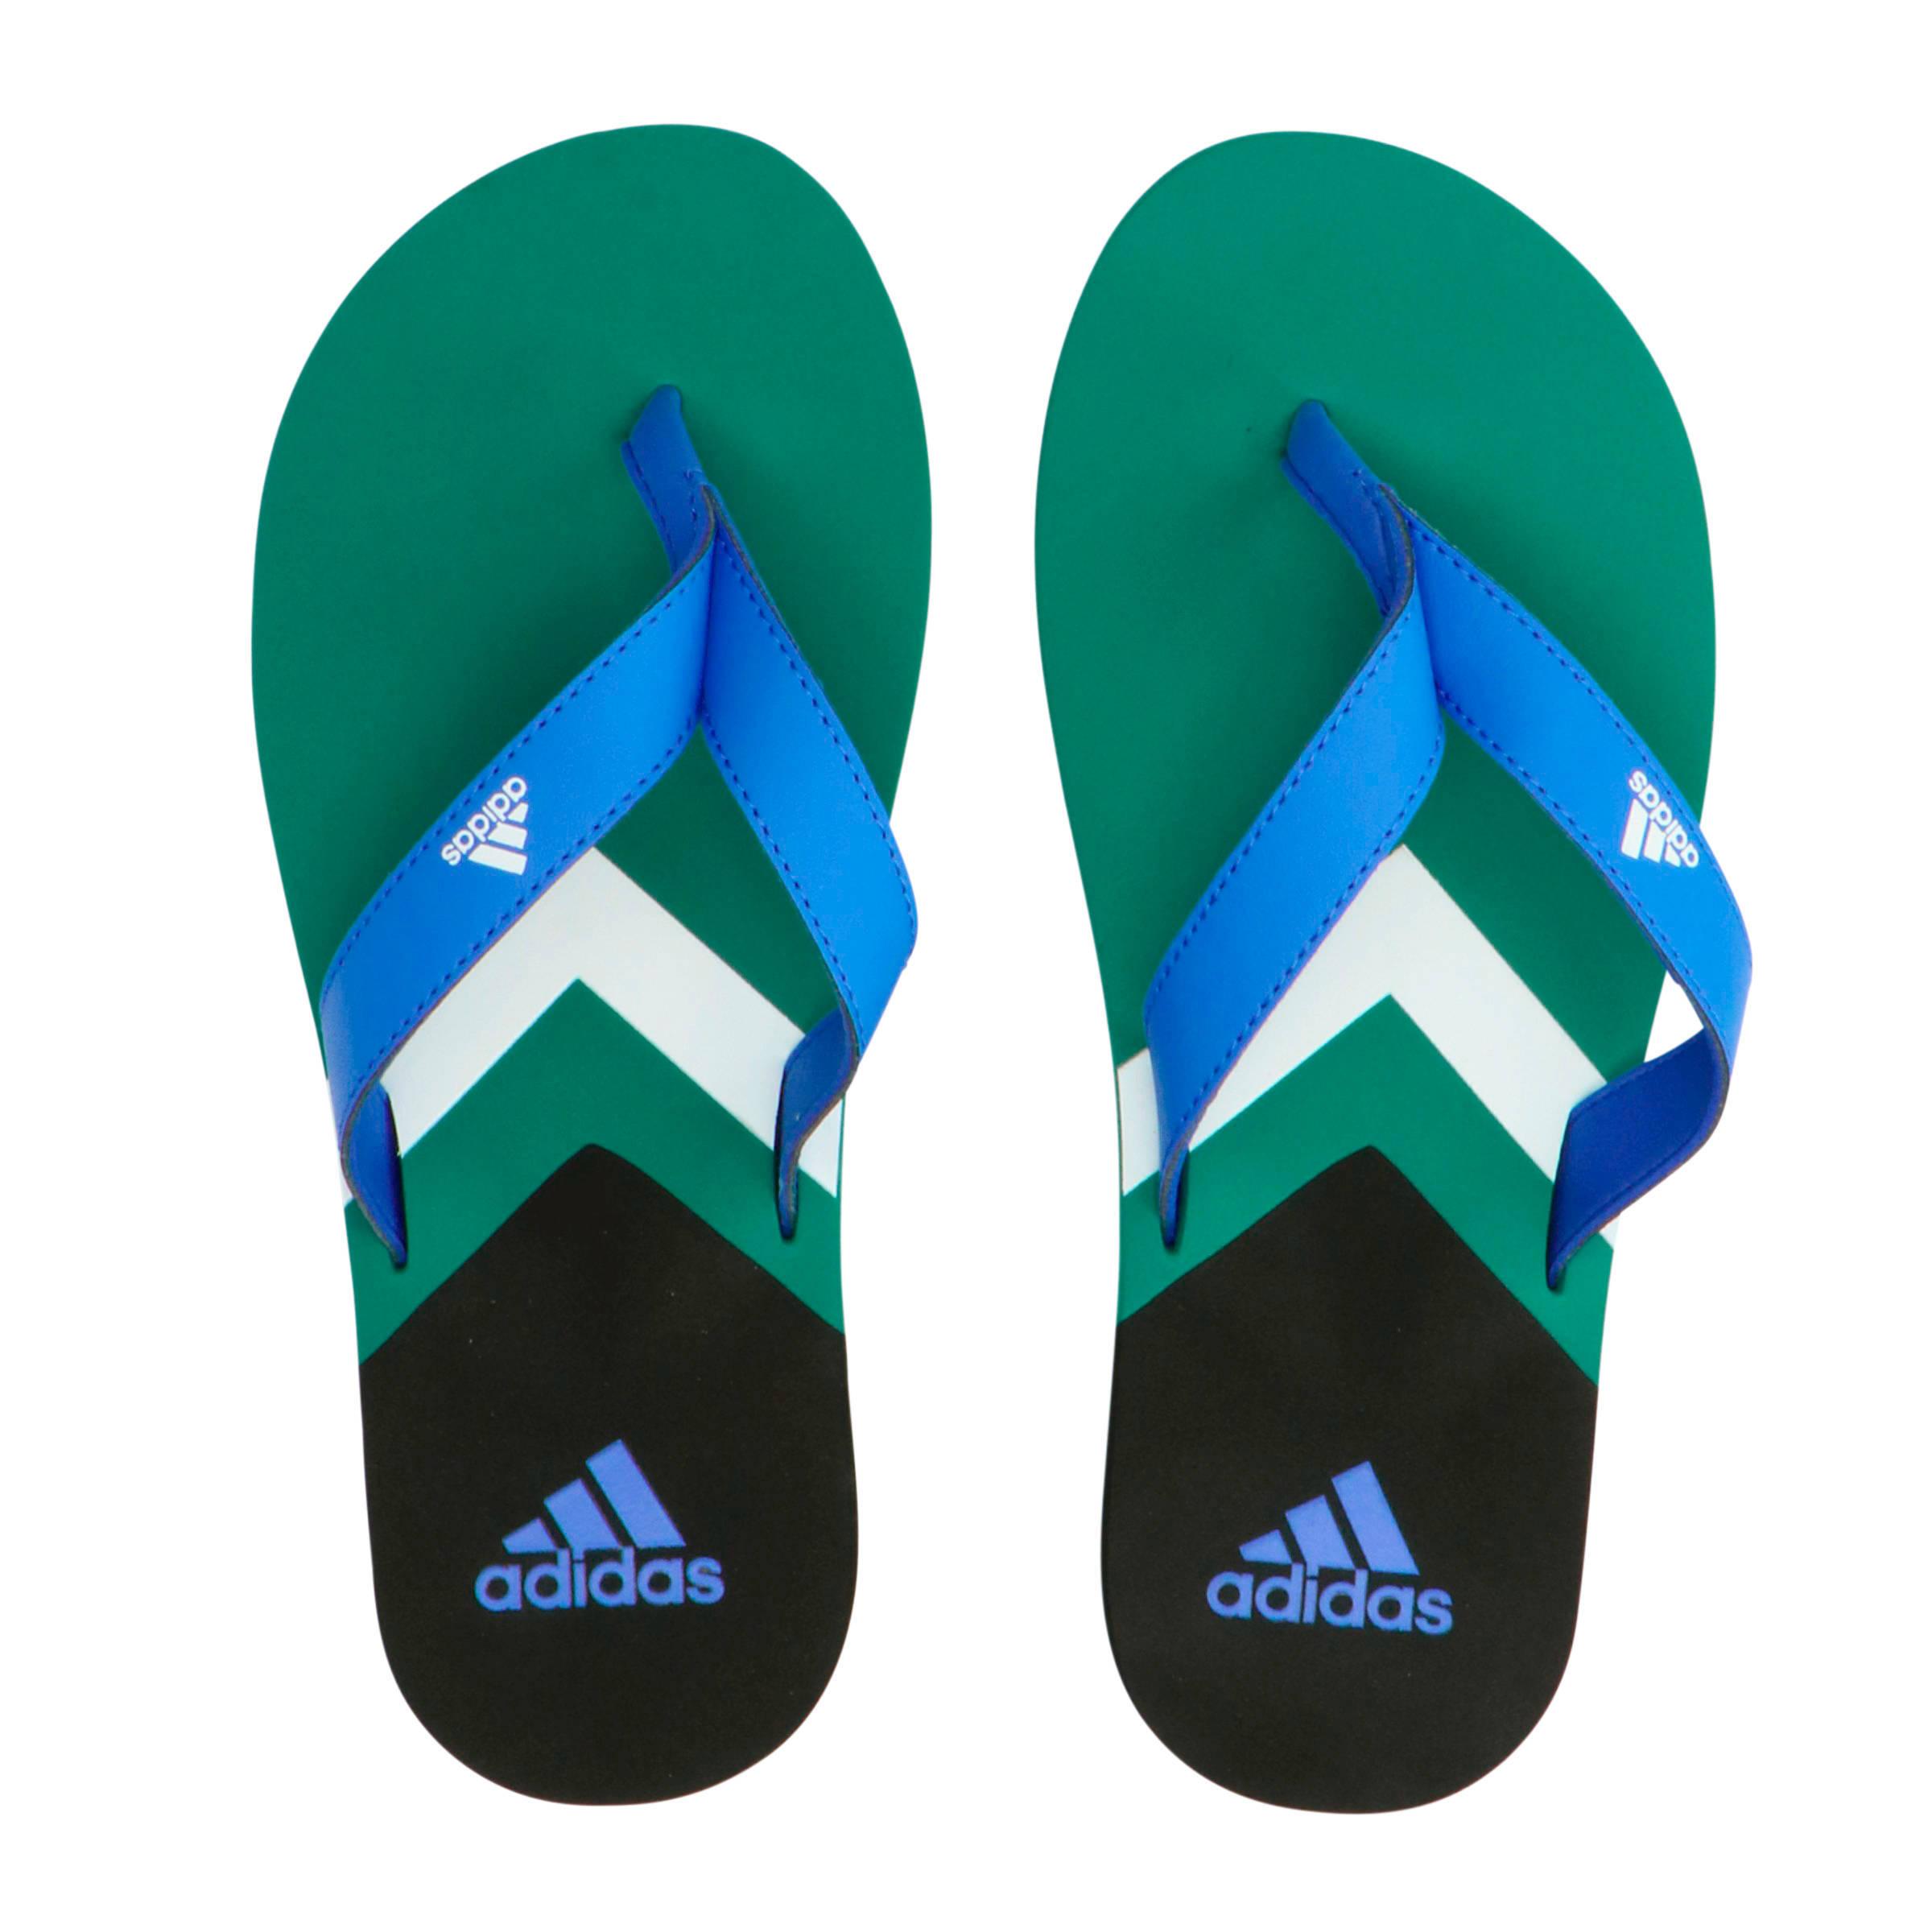 adidas slippers blauw groen